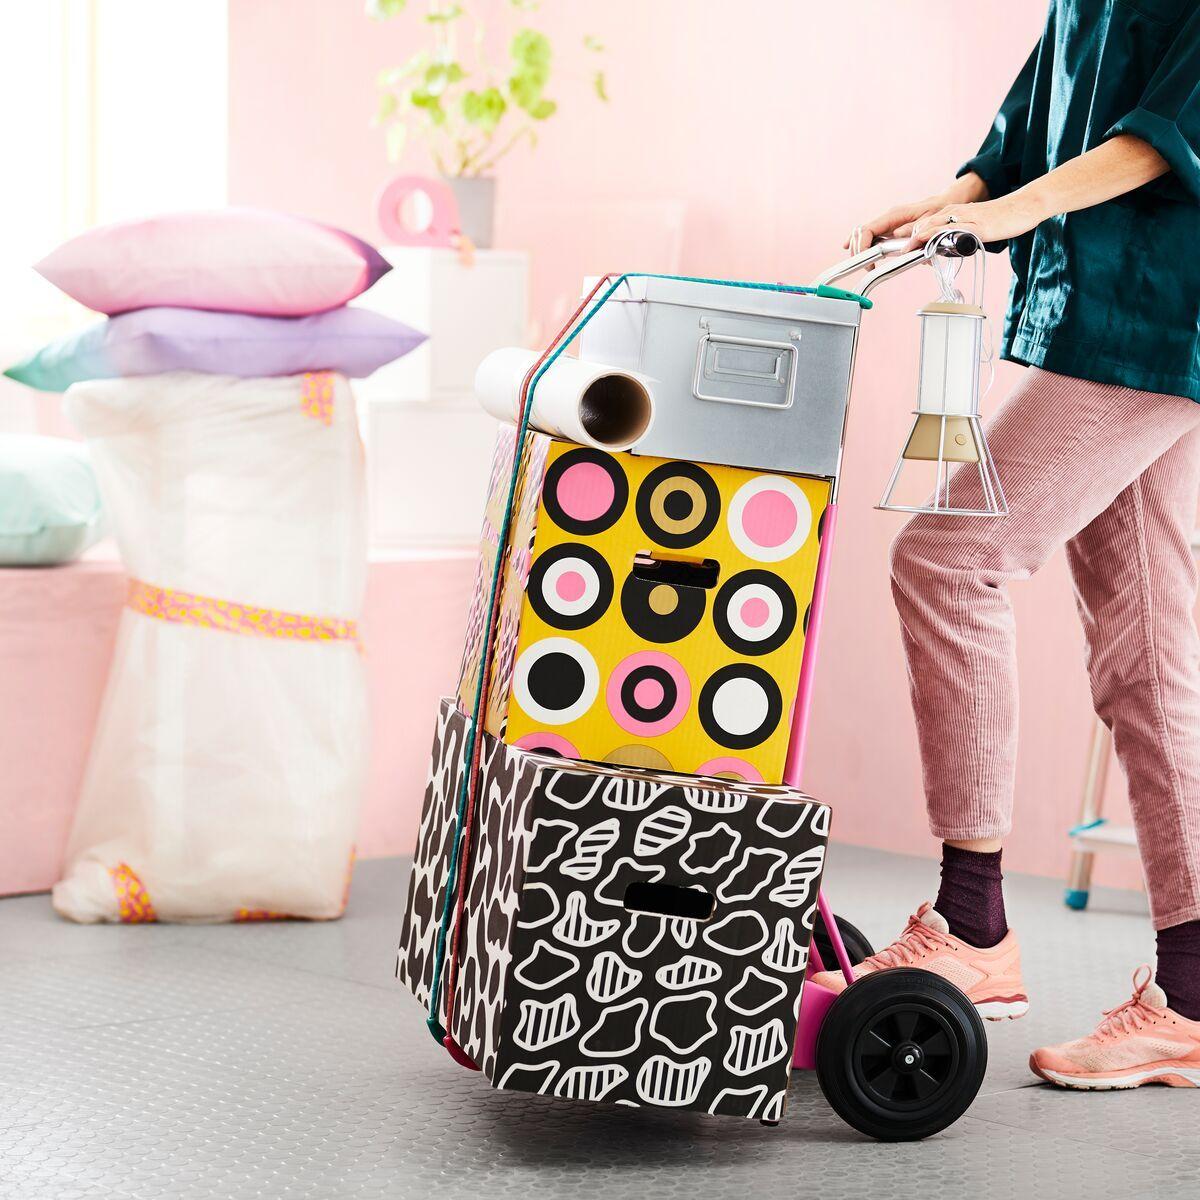 Collections Ikea En Edition Limitee Boite Demenagement Demenagement Ikea